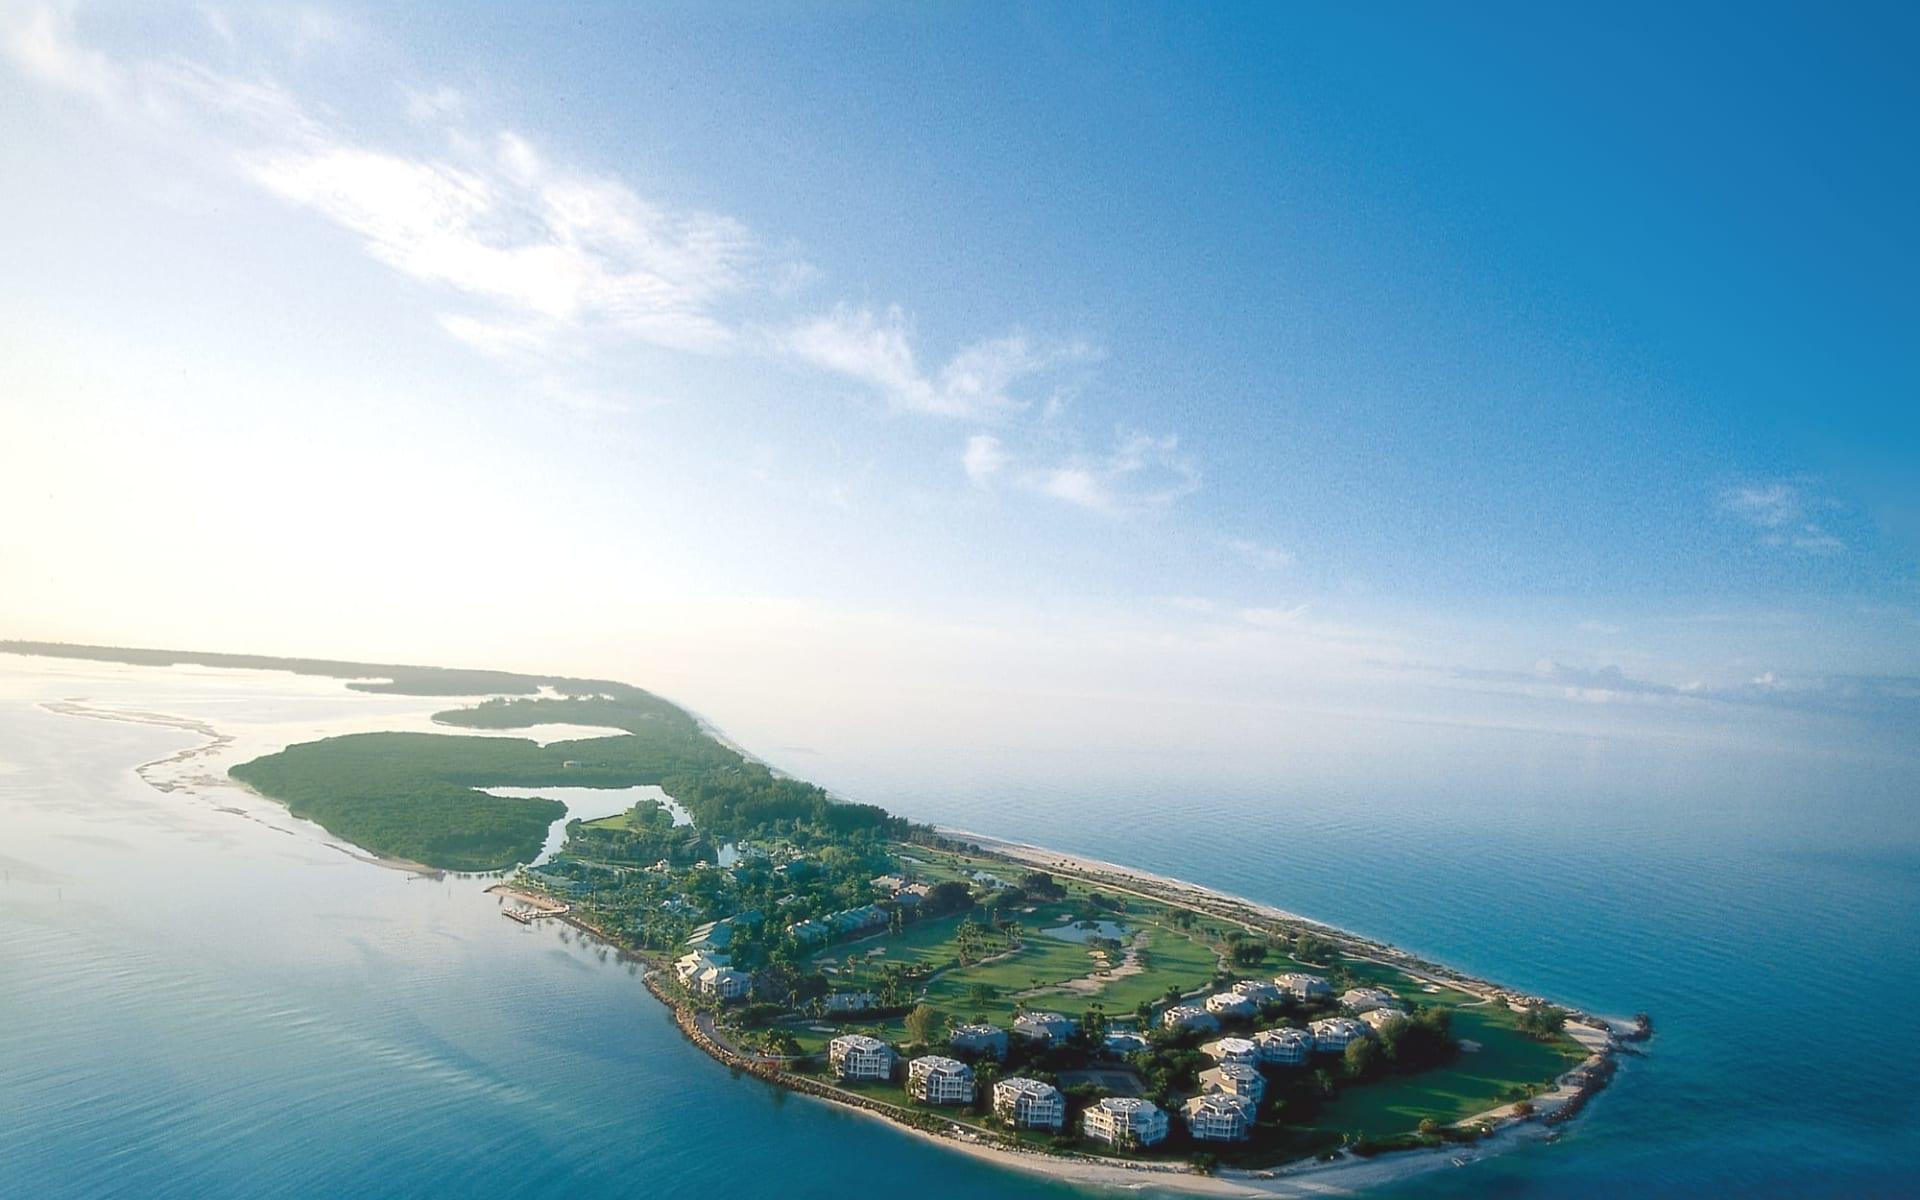 South Seas Island Resort in Captiva Island:  South_Seas_Island_Resort - Aerial